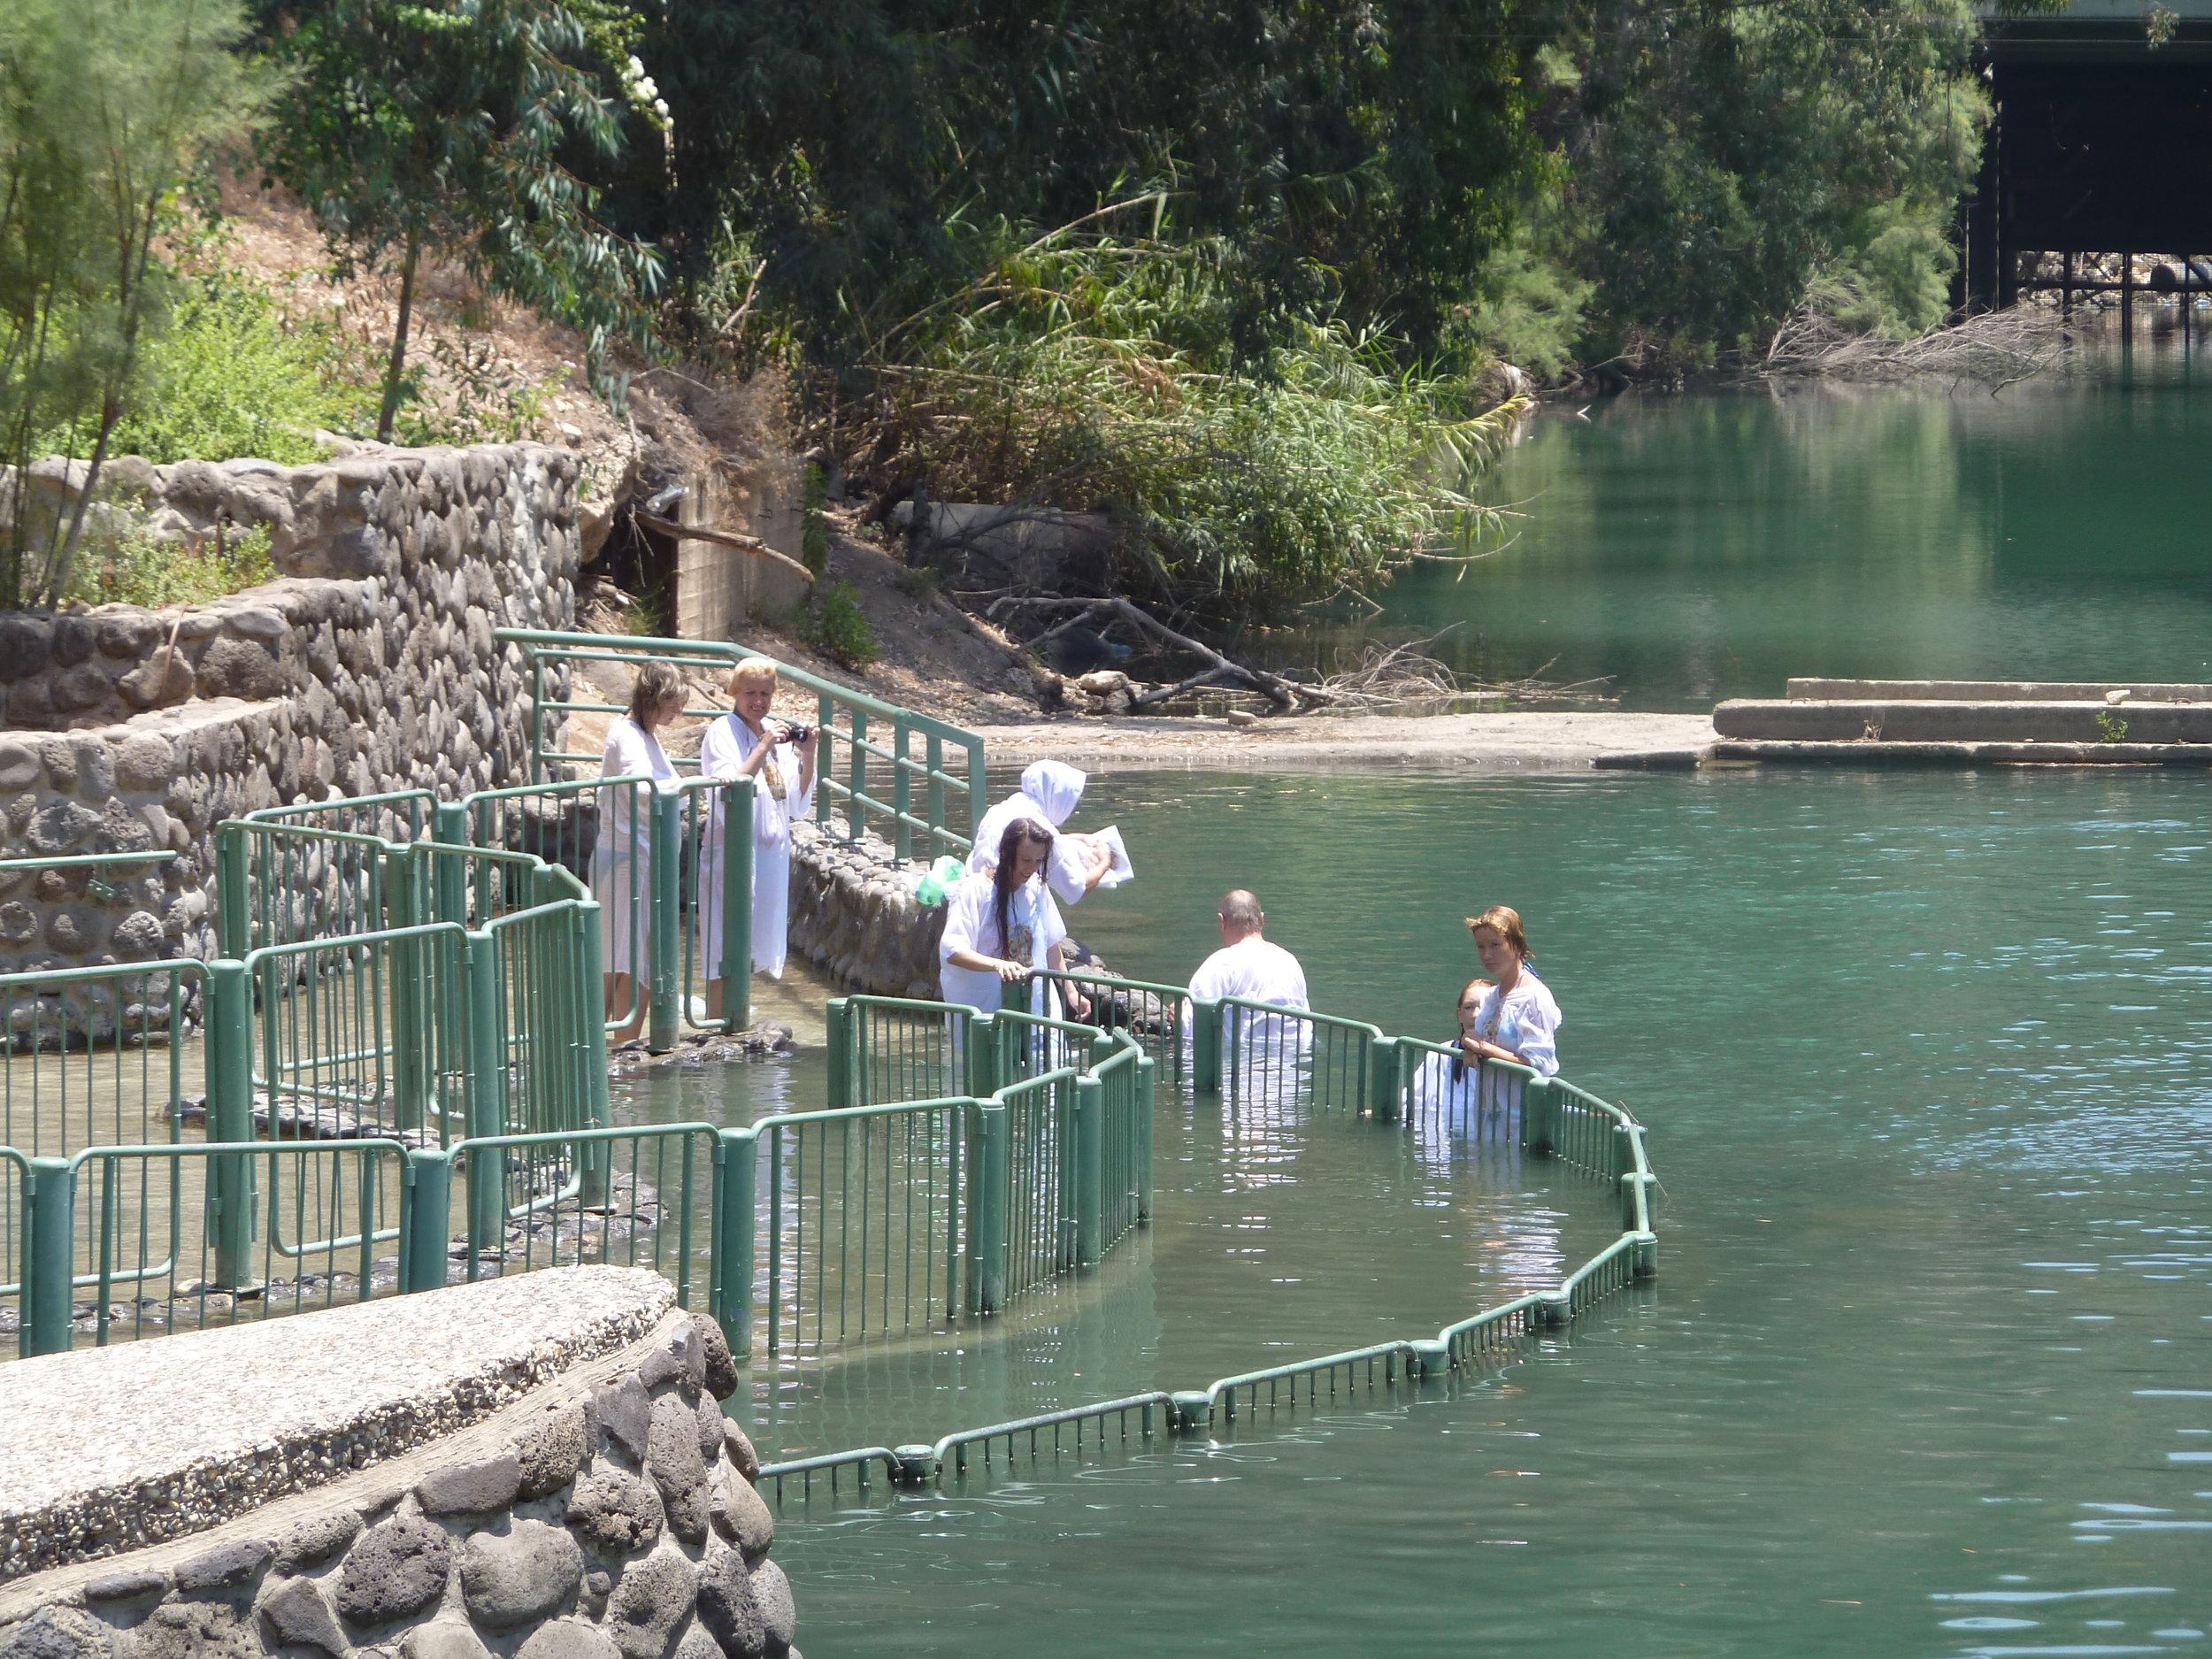 Baptism_in_Jordan_River-holy-land-tours.jpg